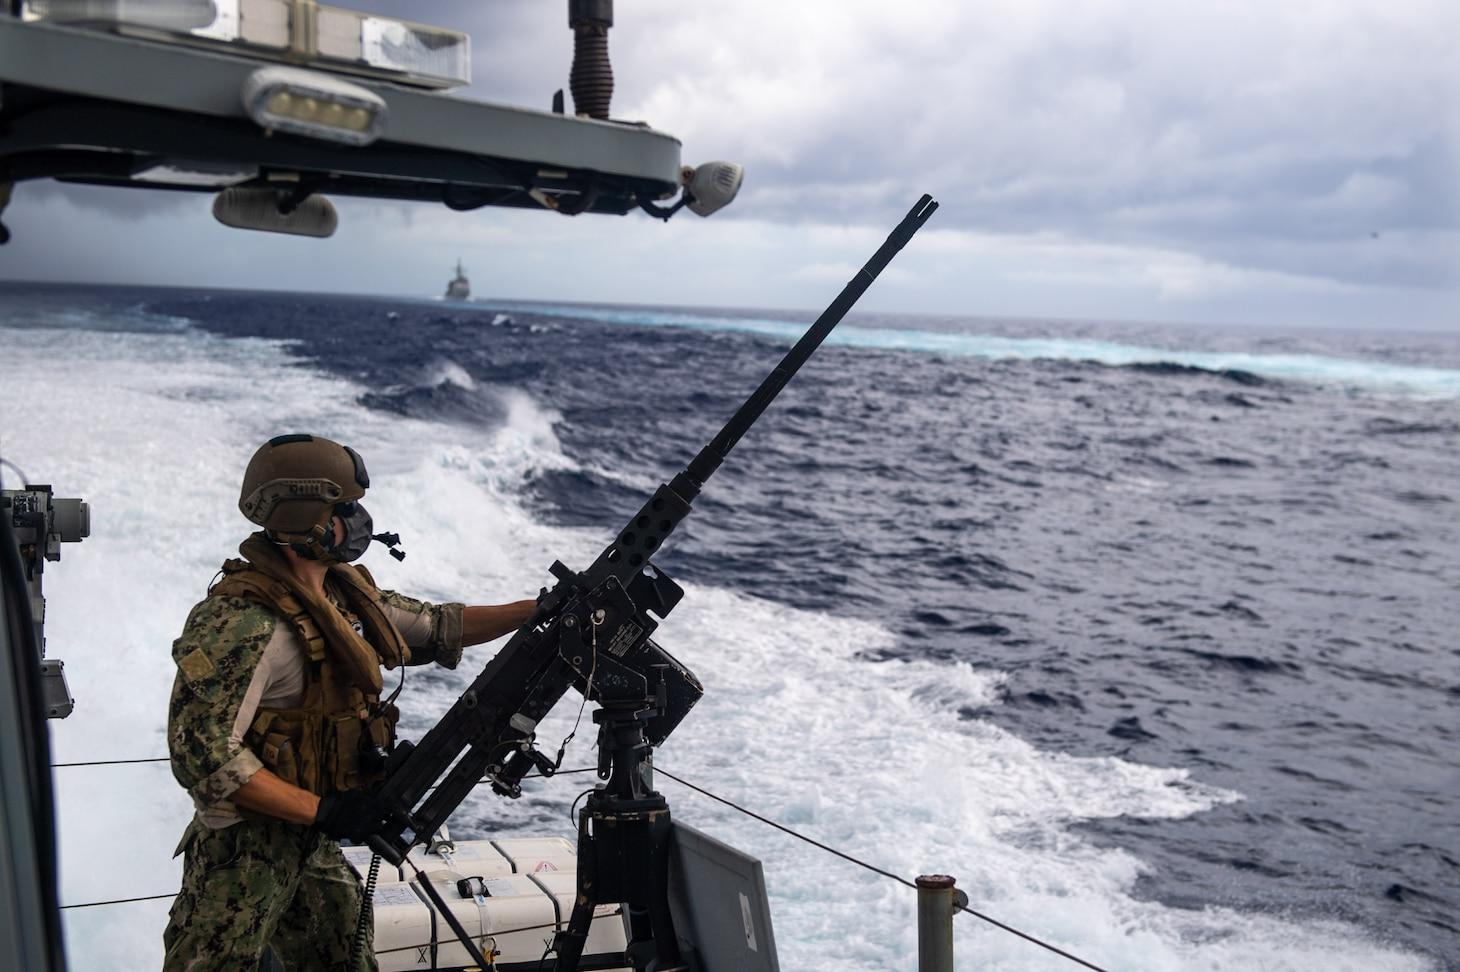 A Sailor assigned to Coastal Riverine Squadron 3, mans a .50-caliber machine gun while aboard a Mark VI patrol boat in support of Valiant Shield 2020.